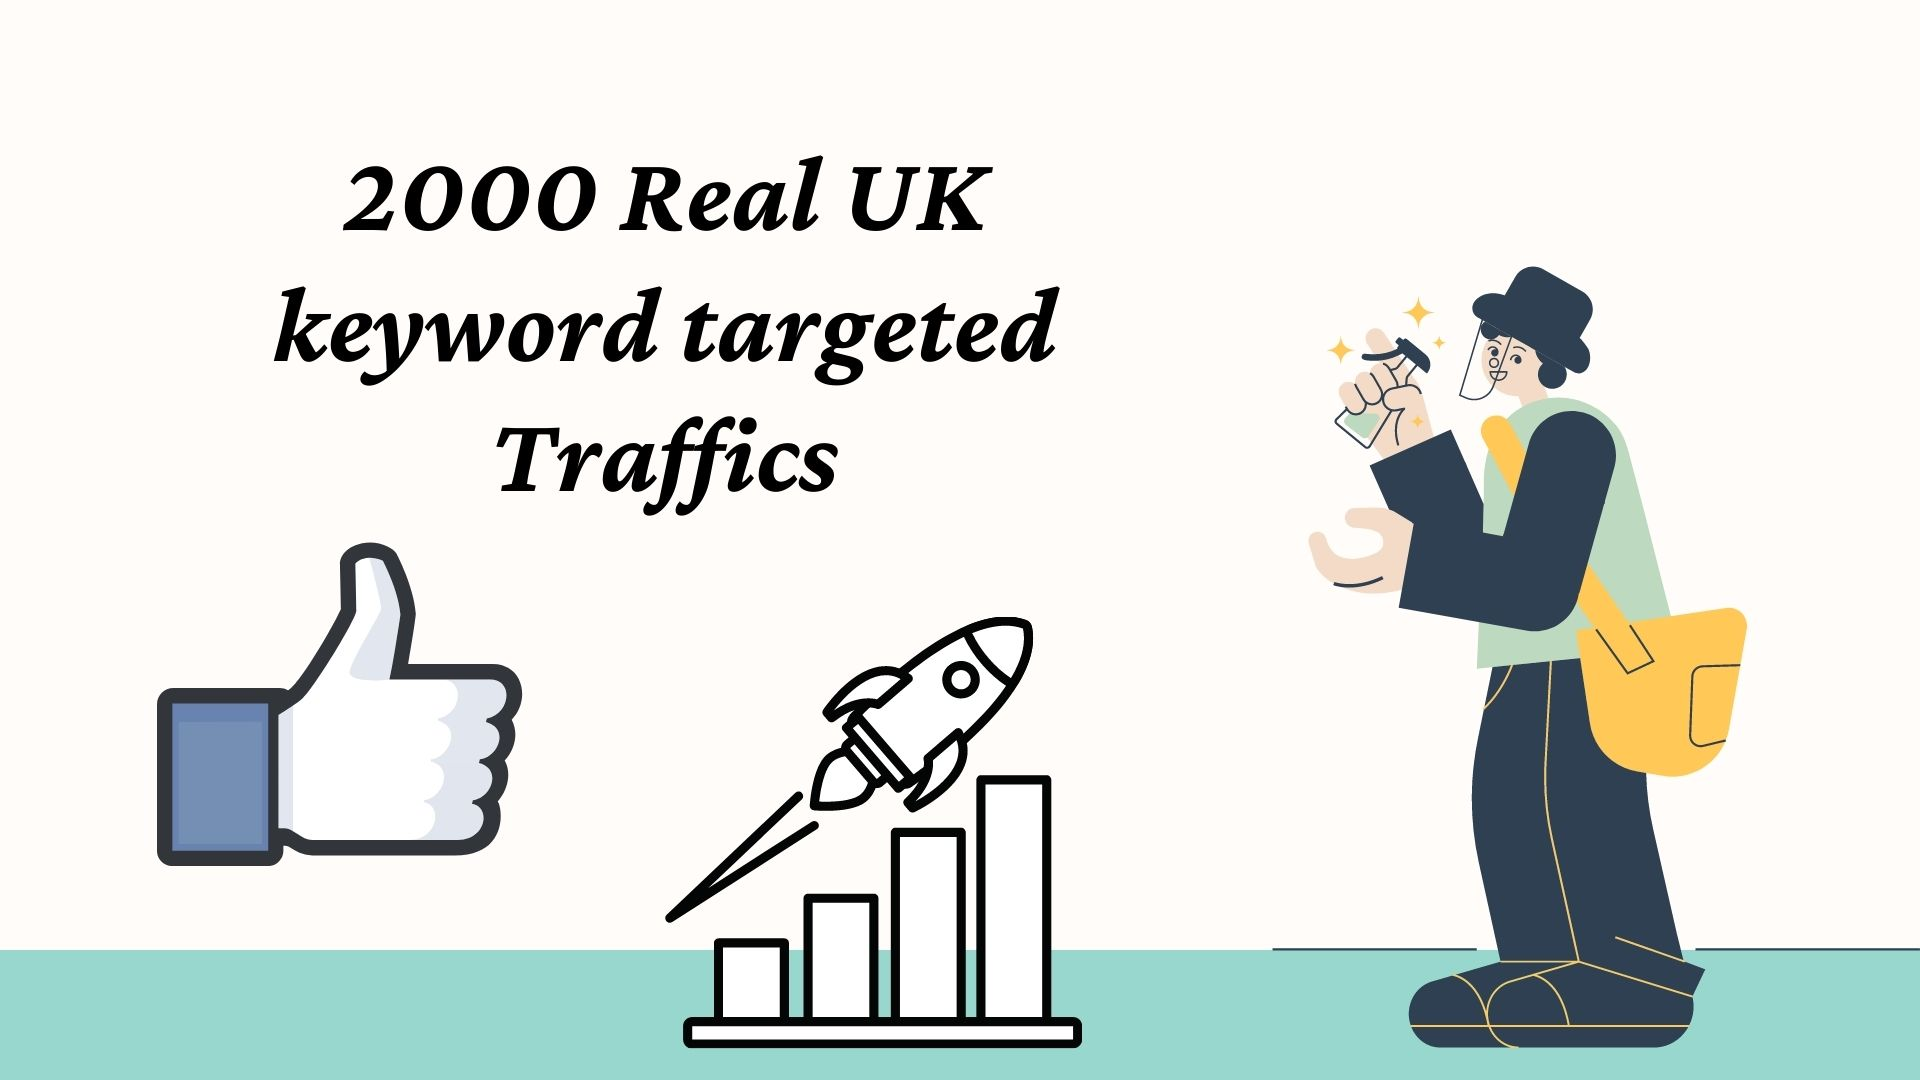 2000 Real UK keyword targeted Traffics